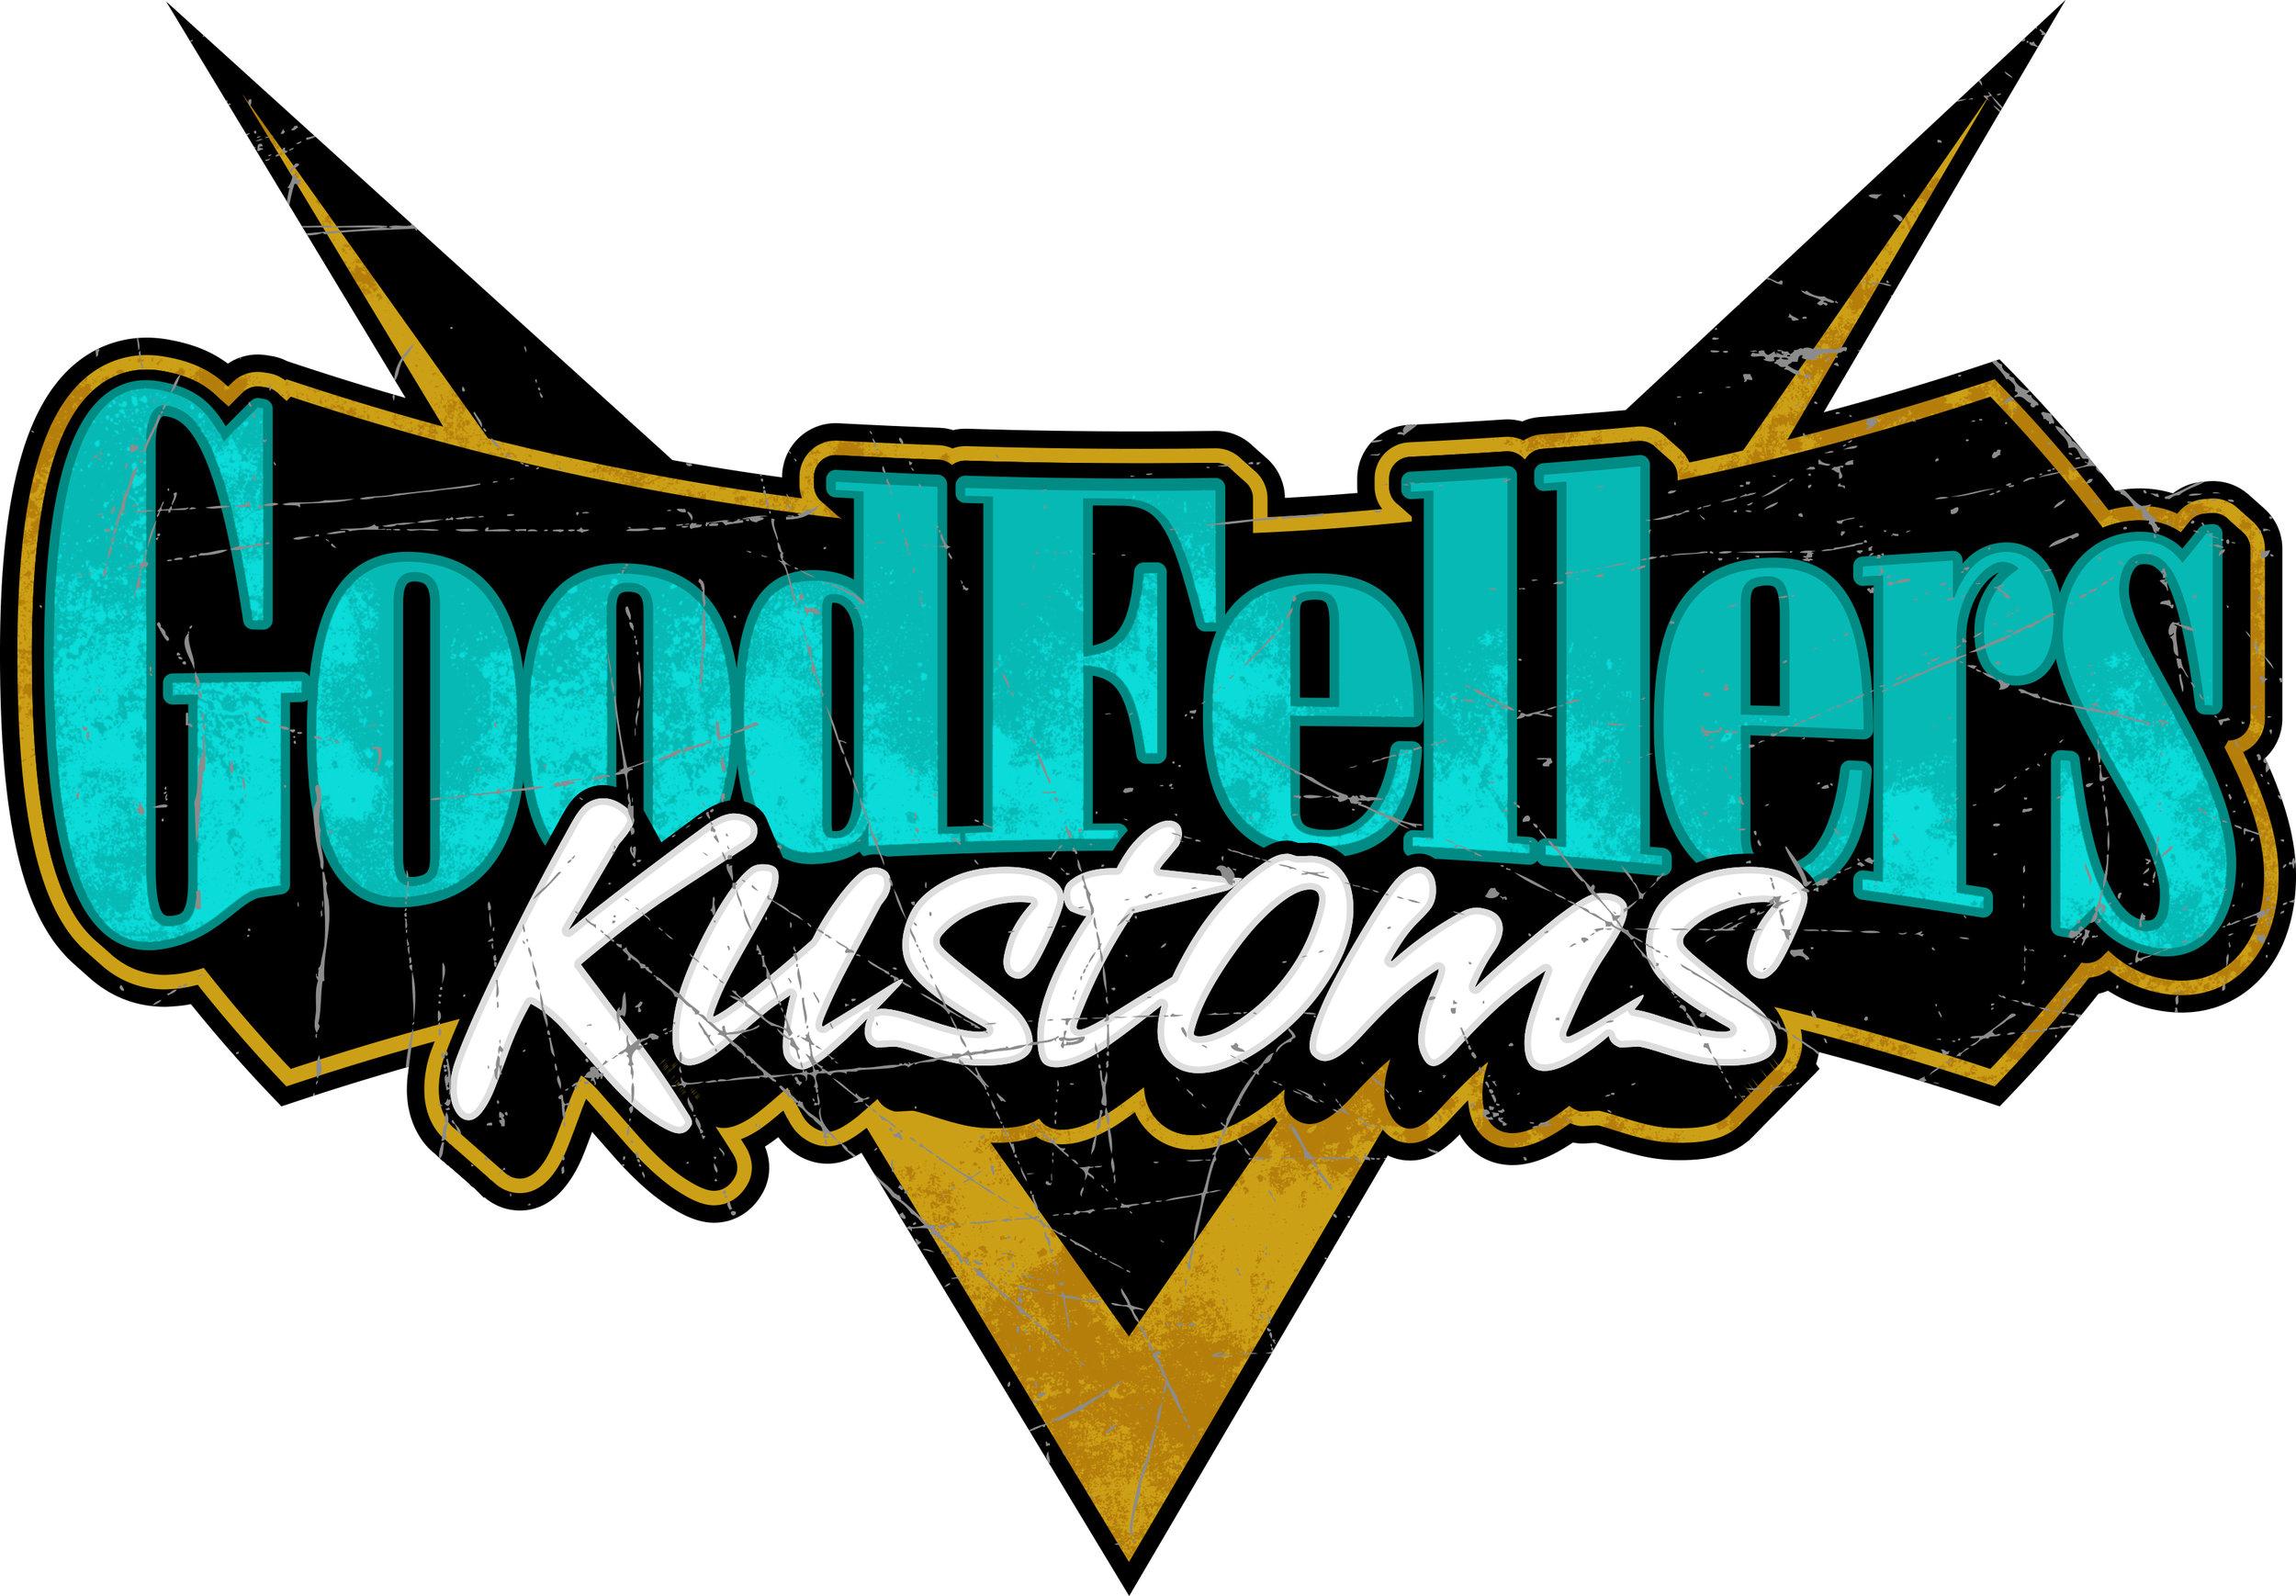 GoodFellersKustoms-HiRes.jpg